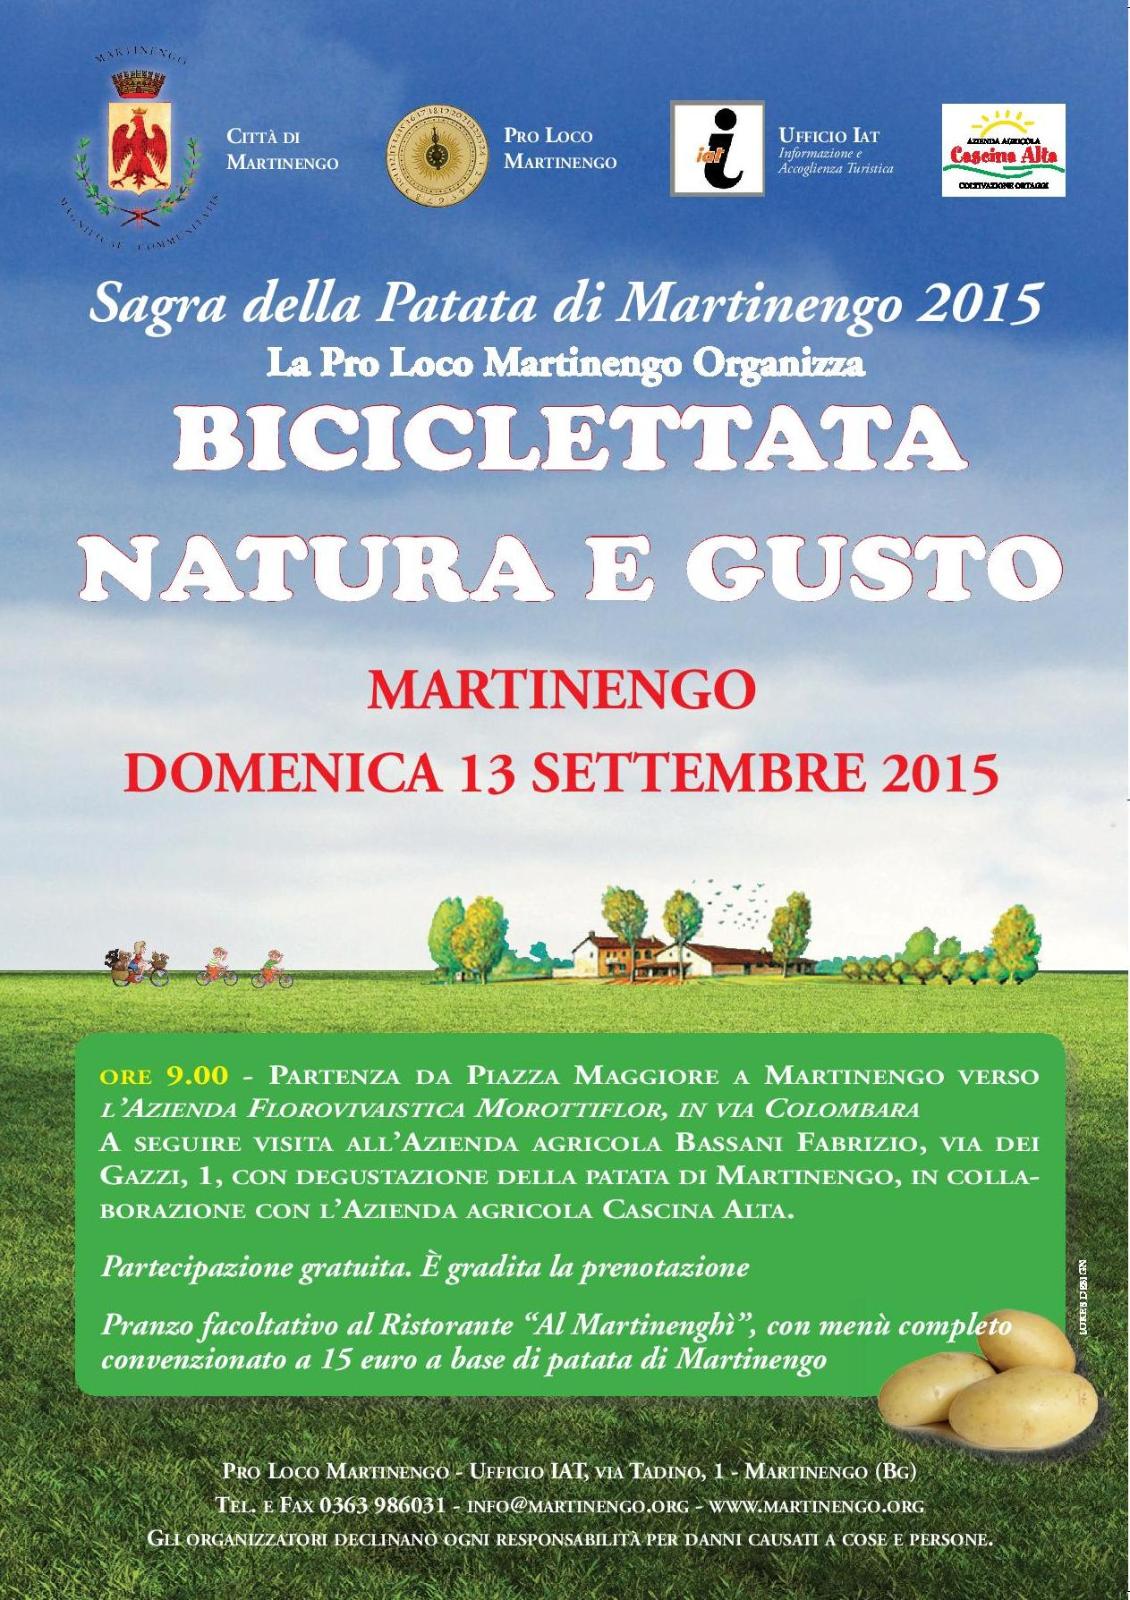 bicicletatta natura e gusto